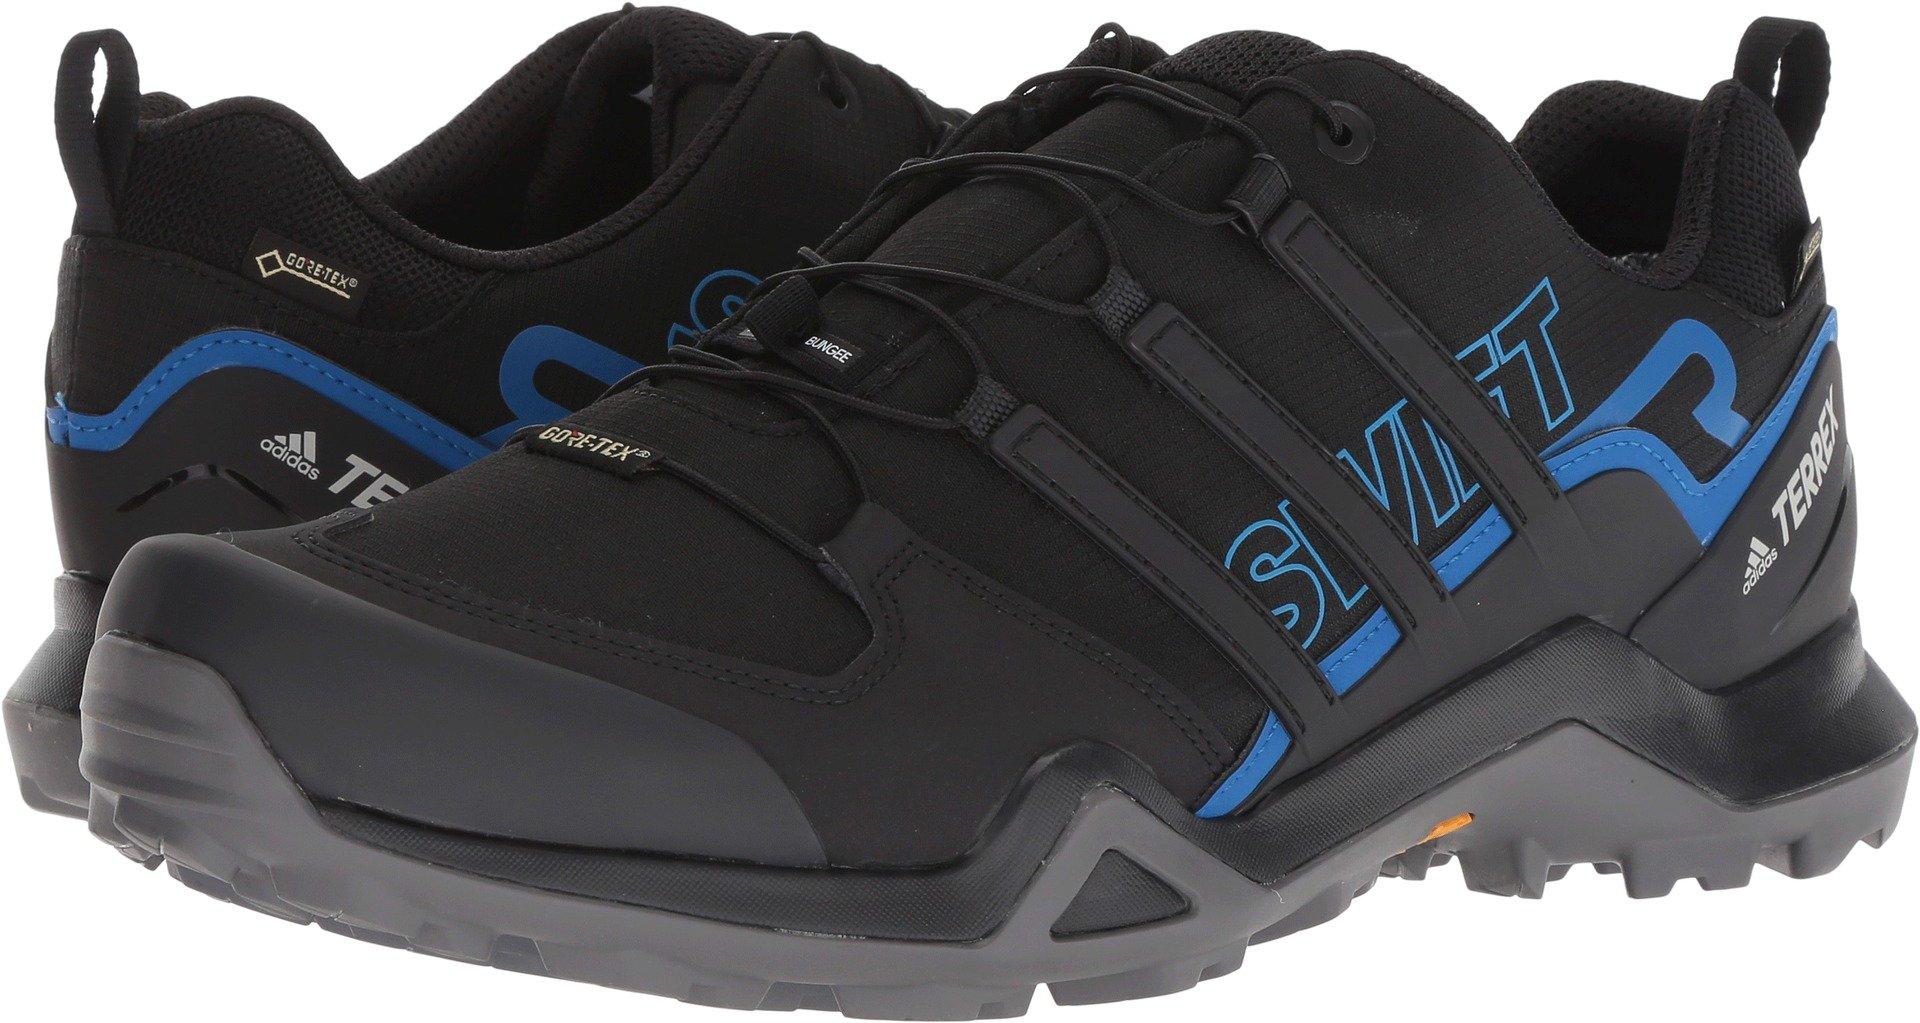 adidas outdoor Men's Terrex Swift R2 GTX¿ Black/Black/Bright Blue 6.5 D US